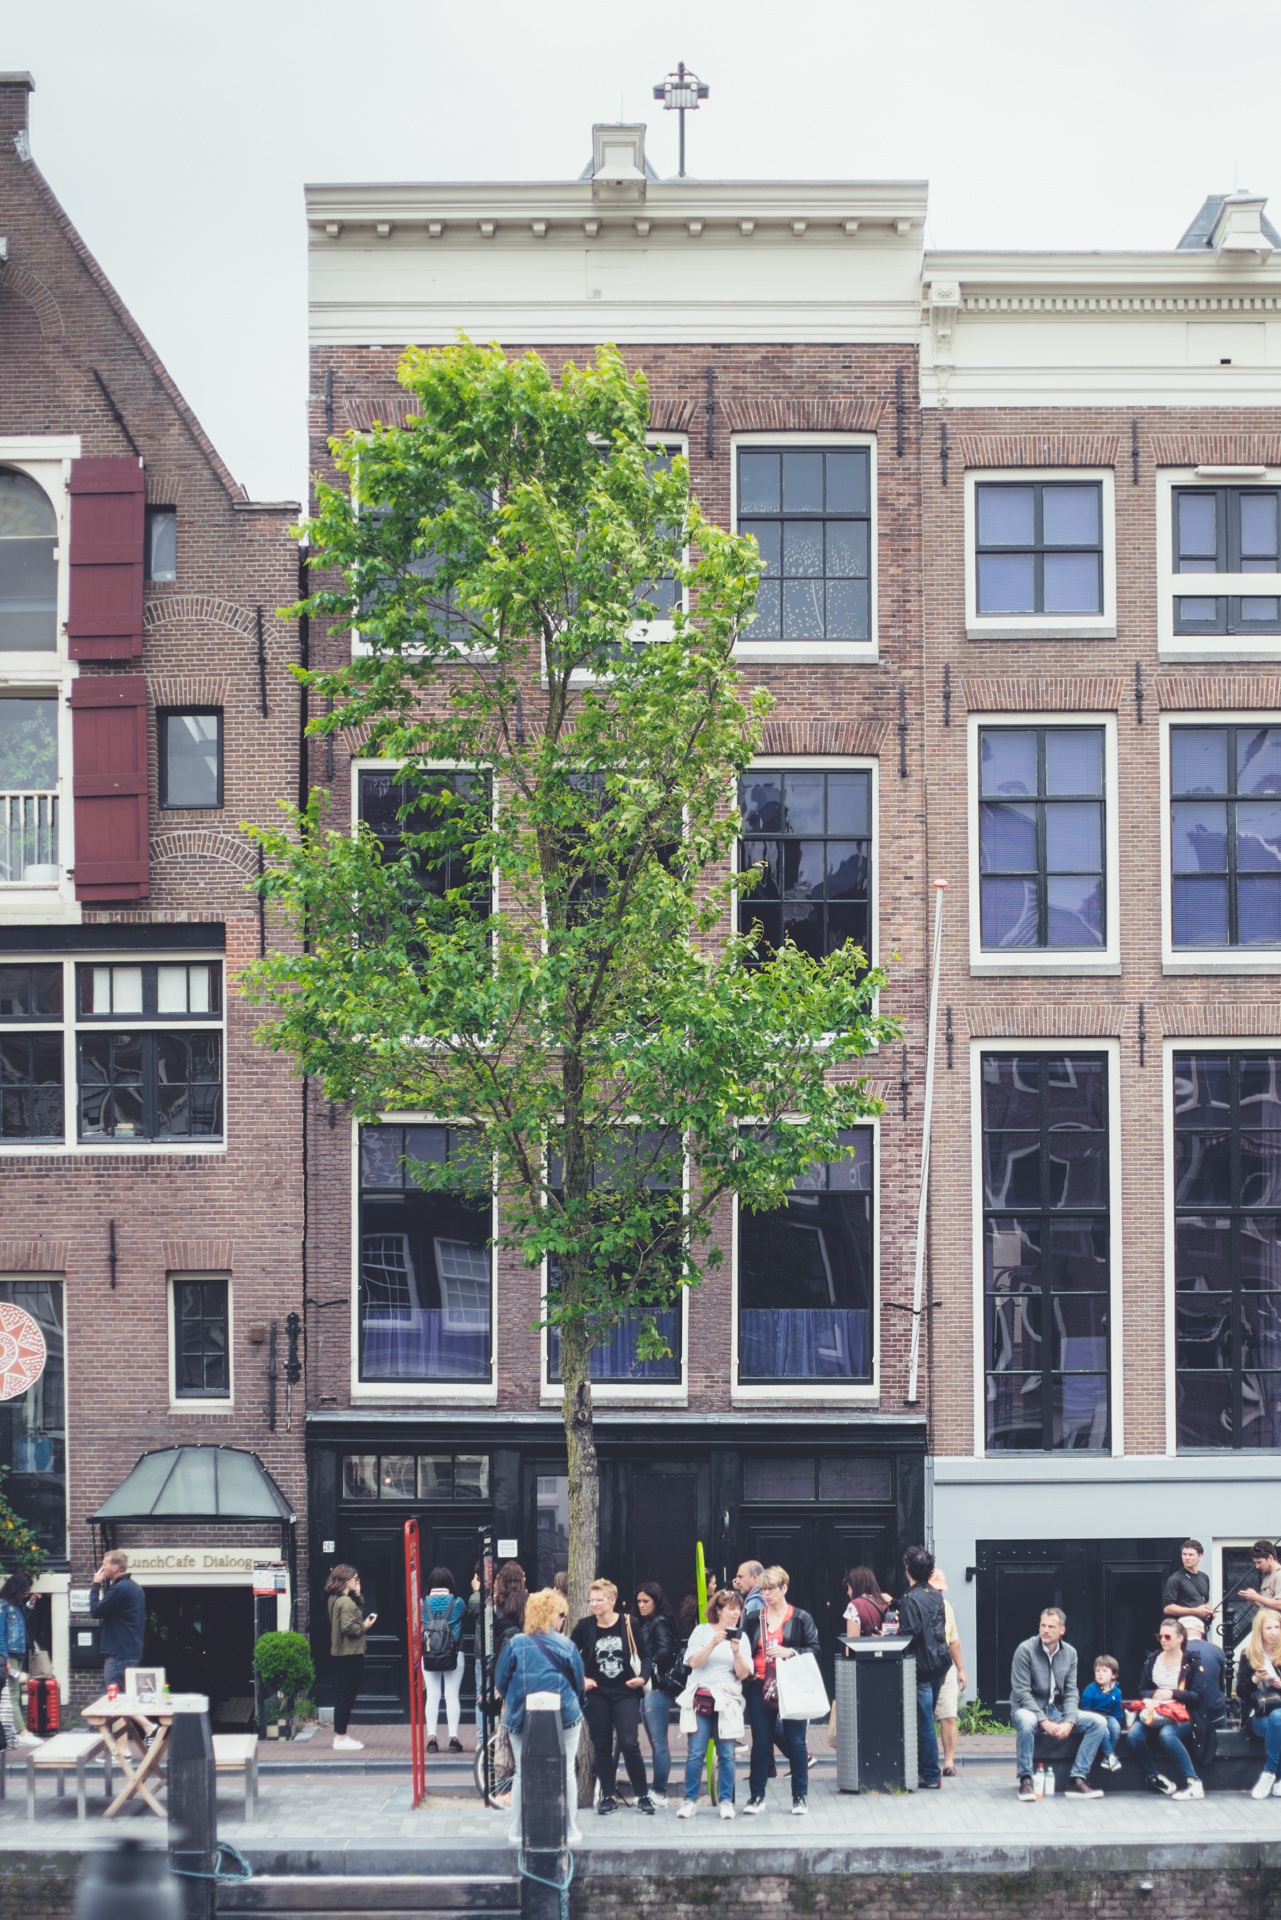 Prinsengracht 263 - The Anne Frank House